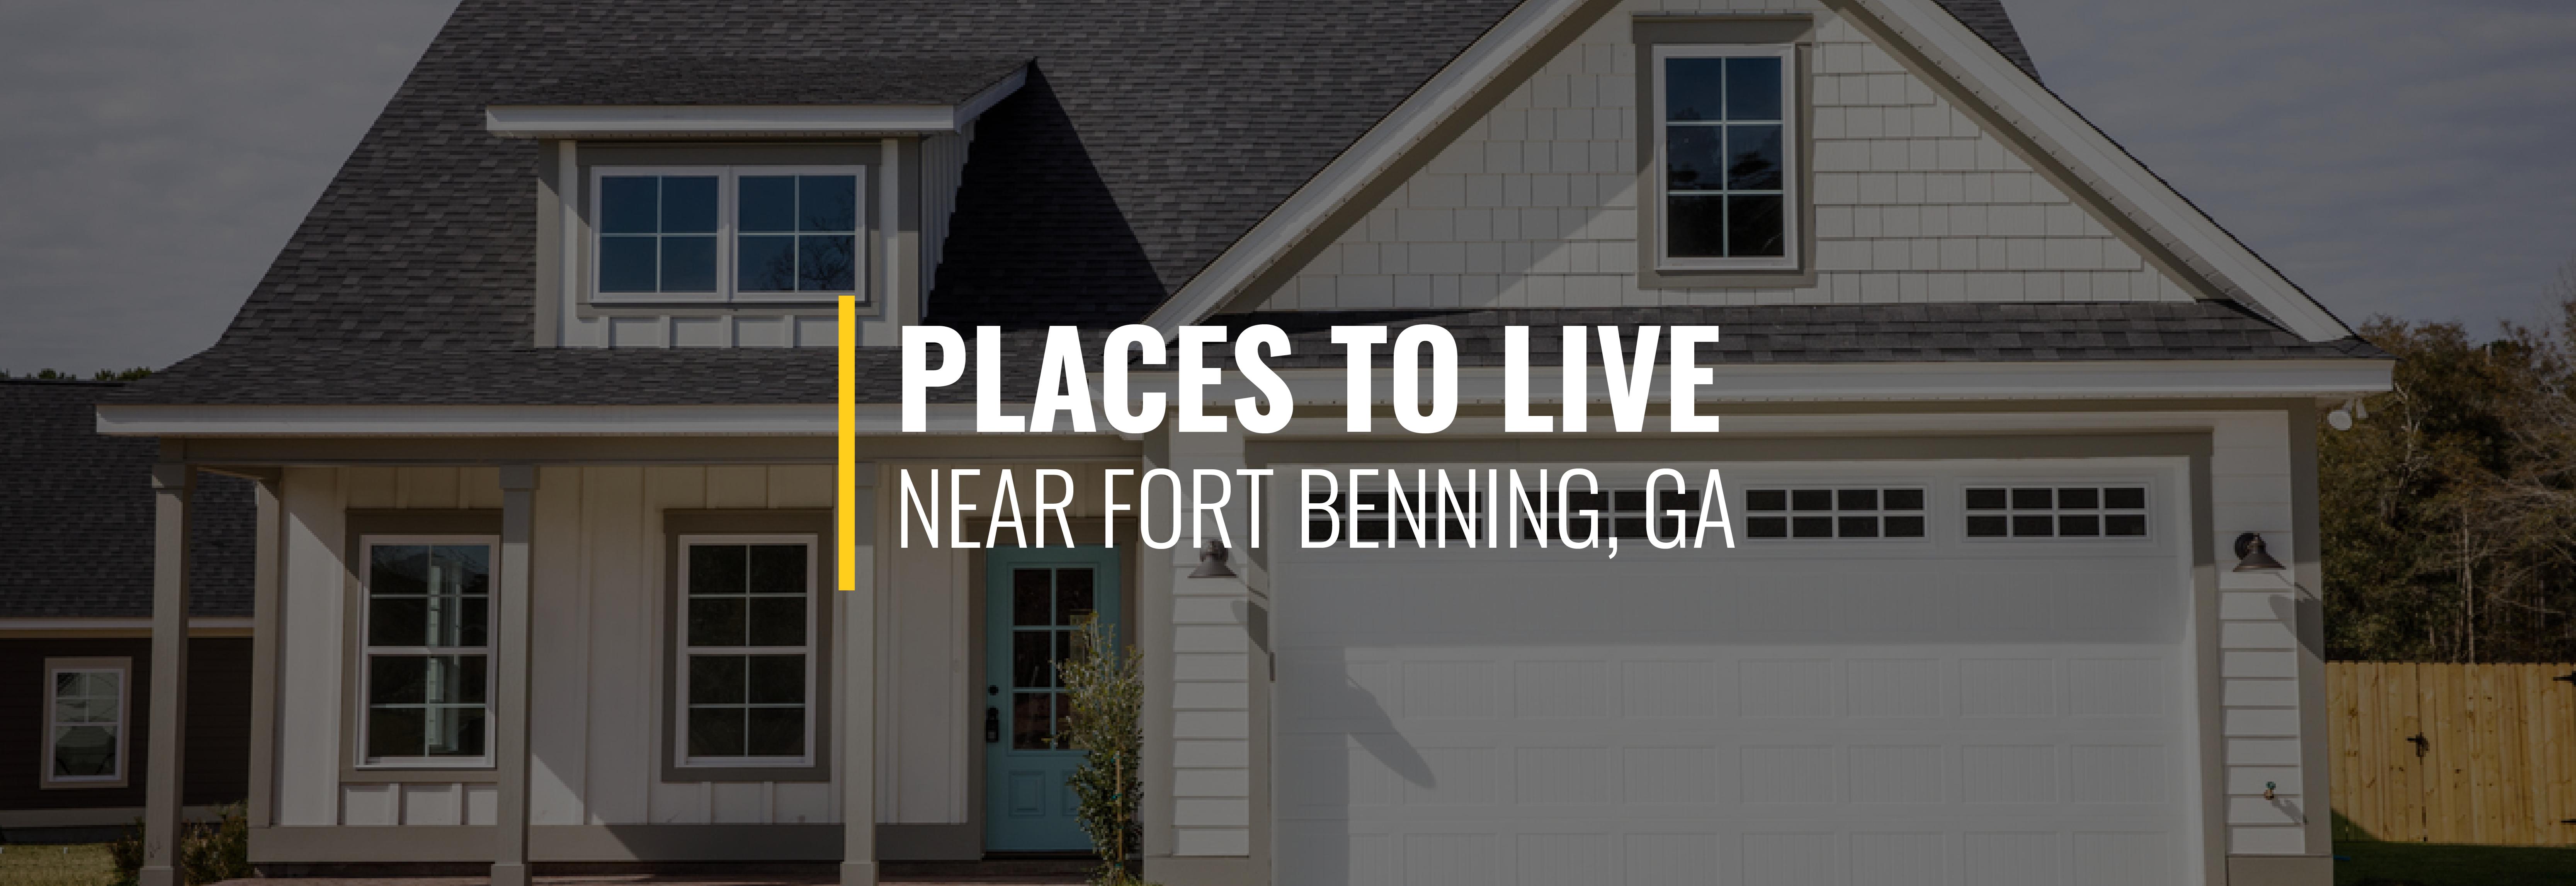 Where Should I Live Near Fort Benning?